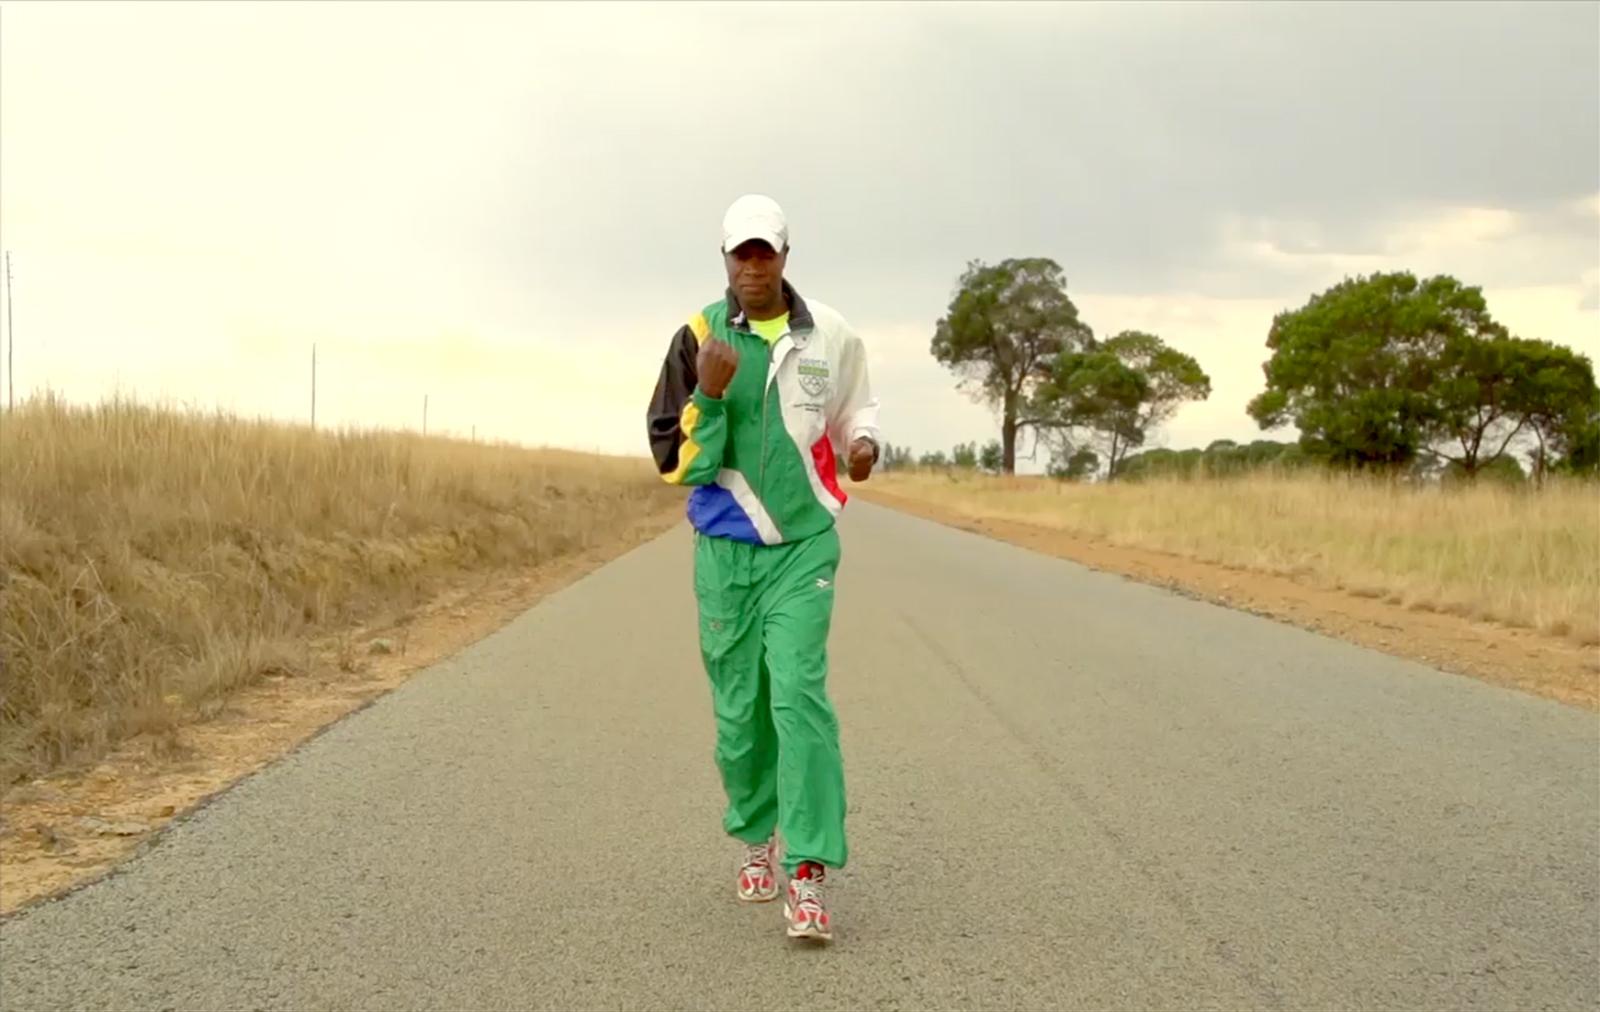 Thugwane